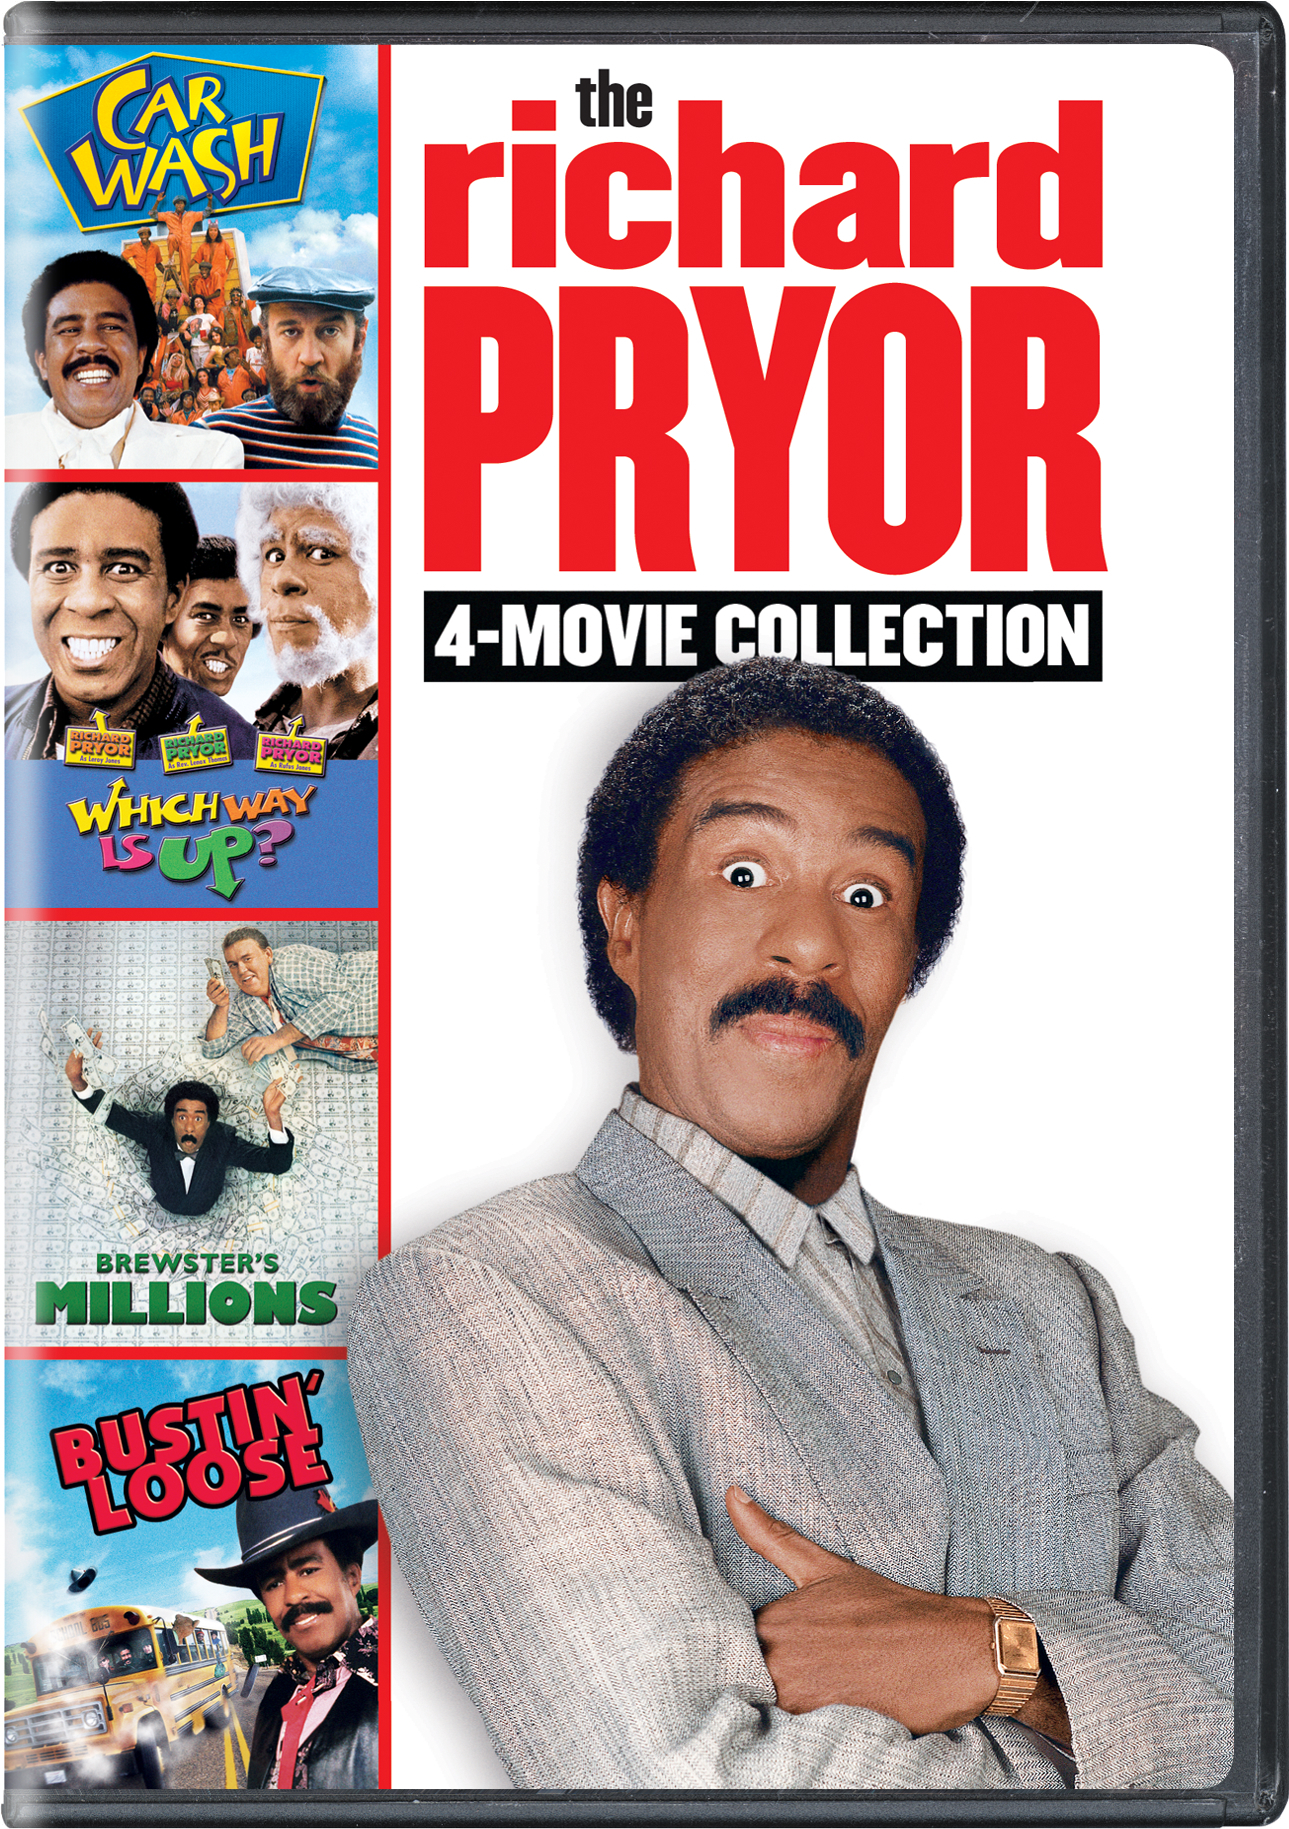 The Richard Pryor 4-Movie Collection [DVD]